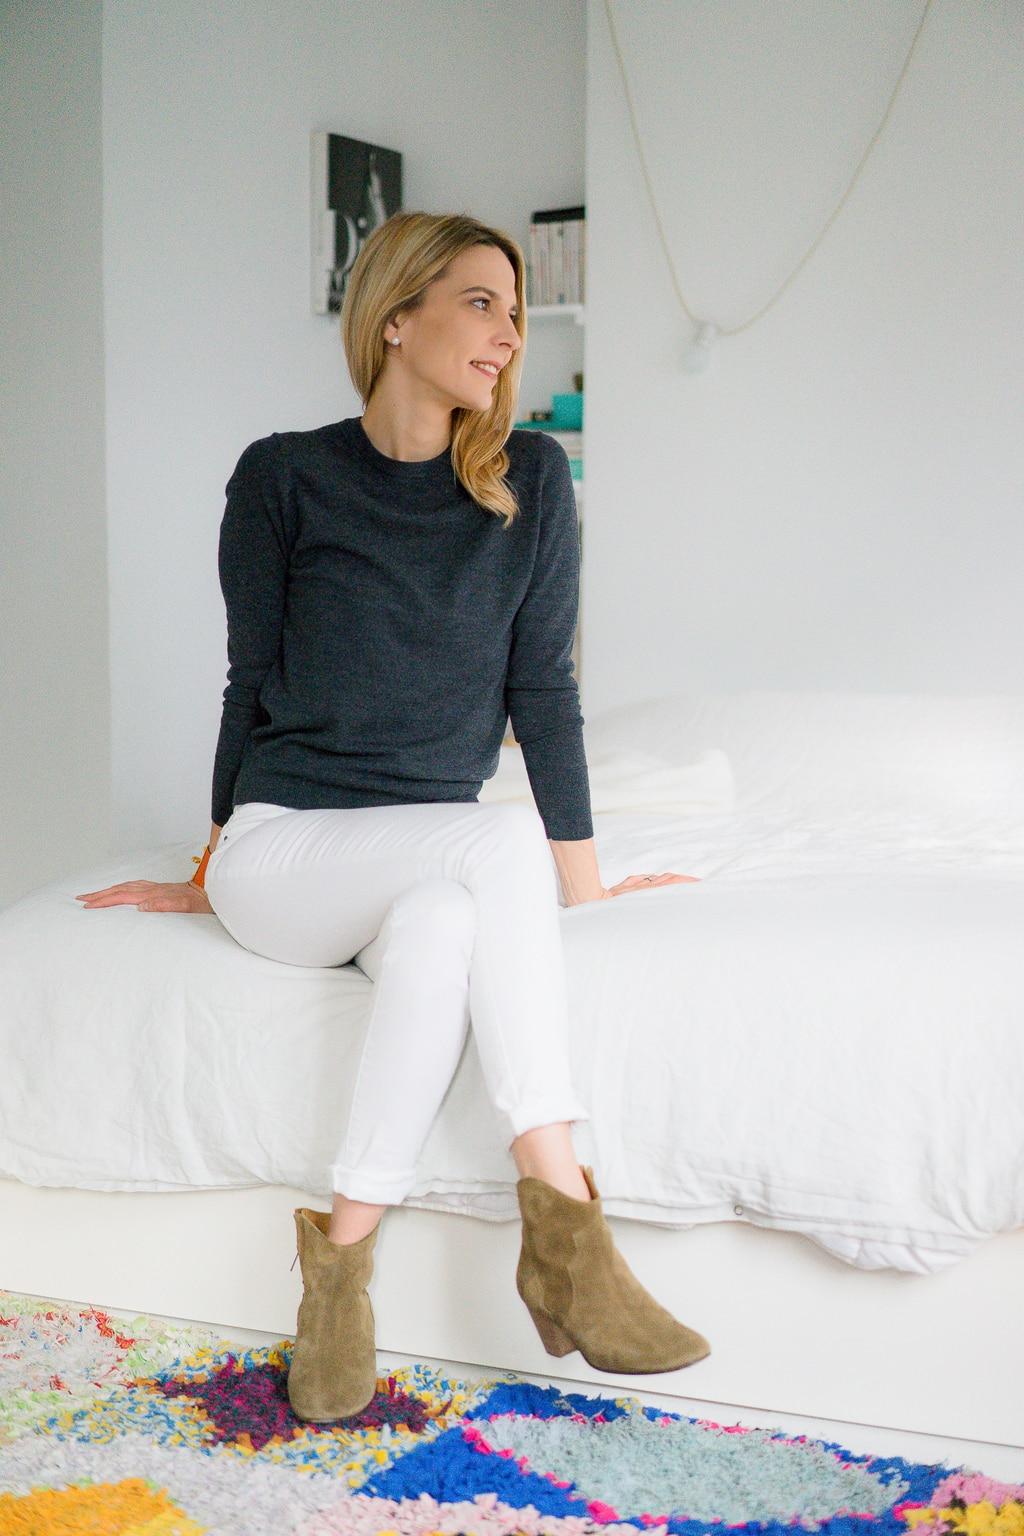 le jean blanc le dressing id al. Black Bedroom Furniture Sets. Home Design Ideas